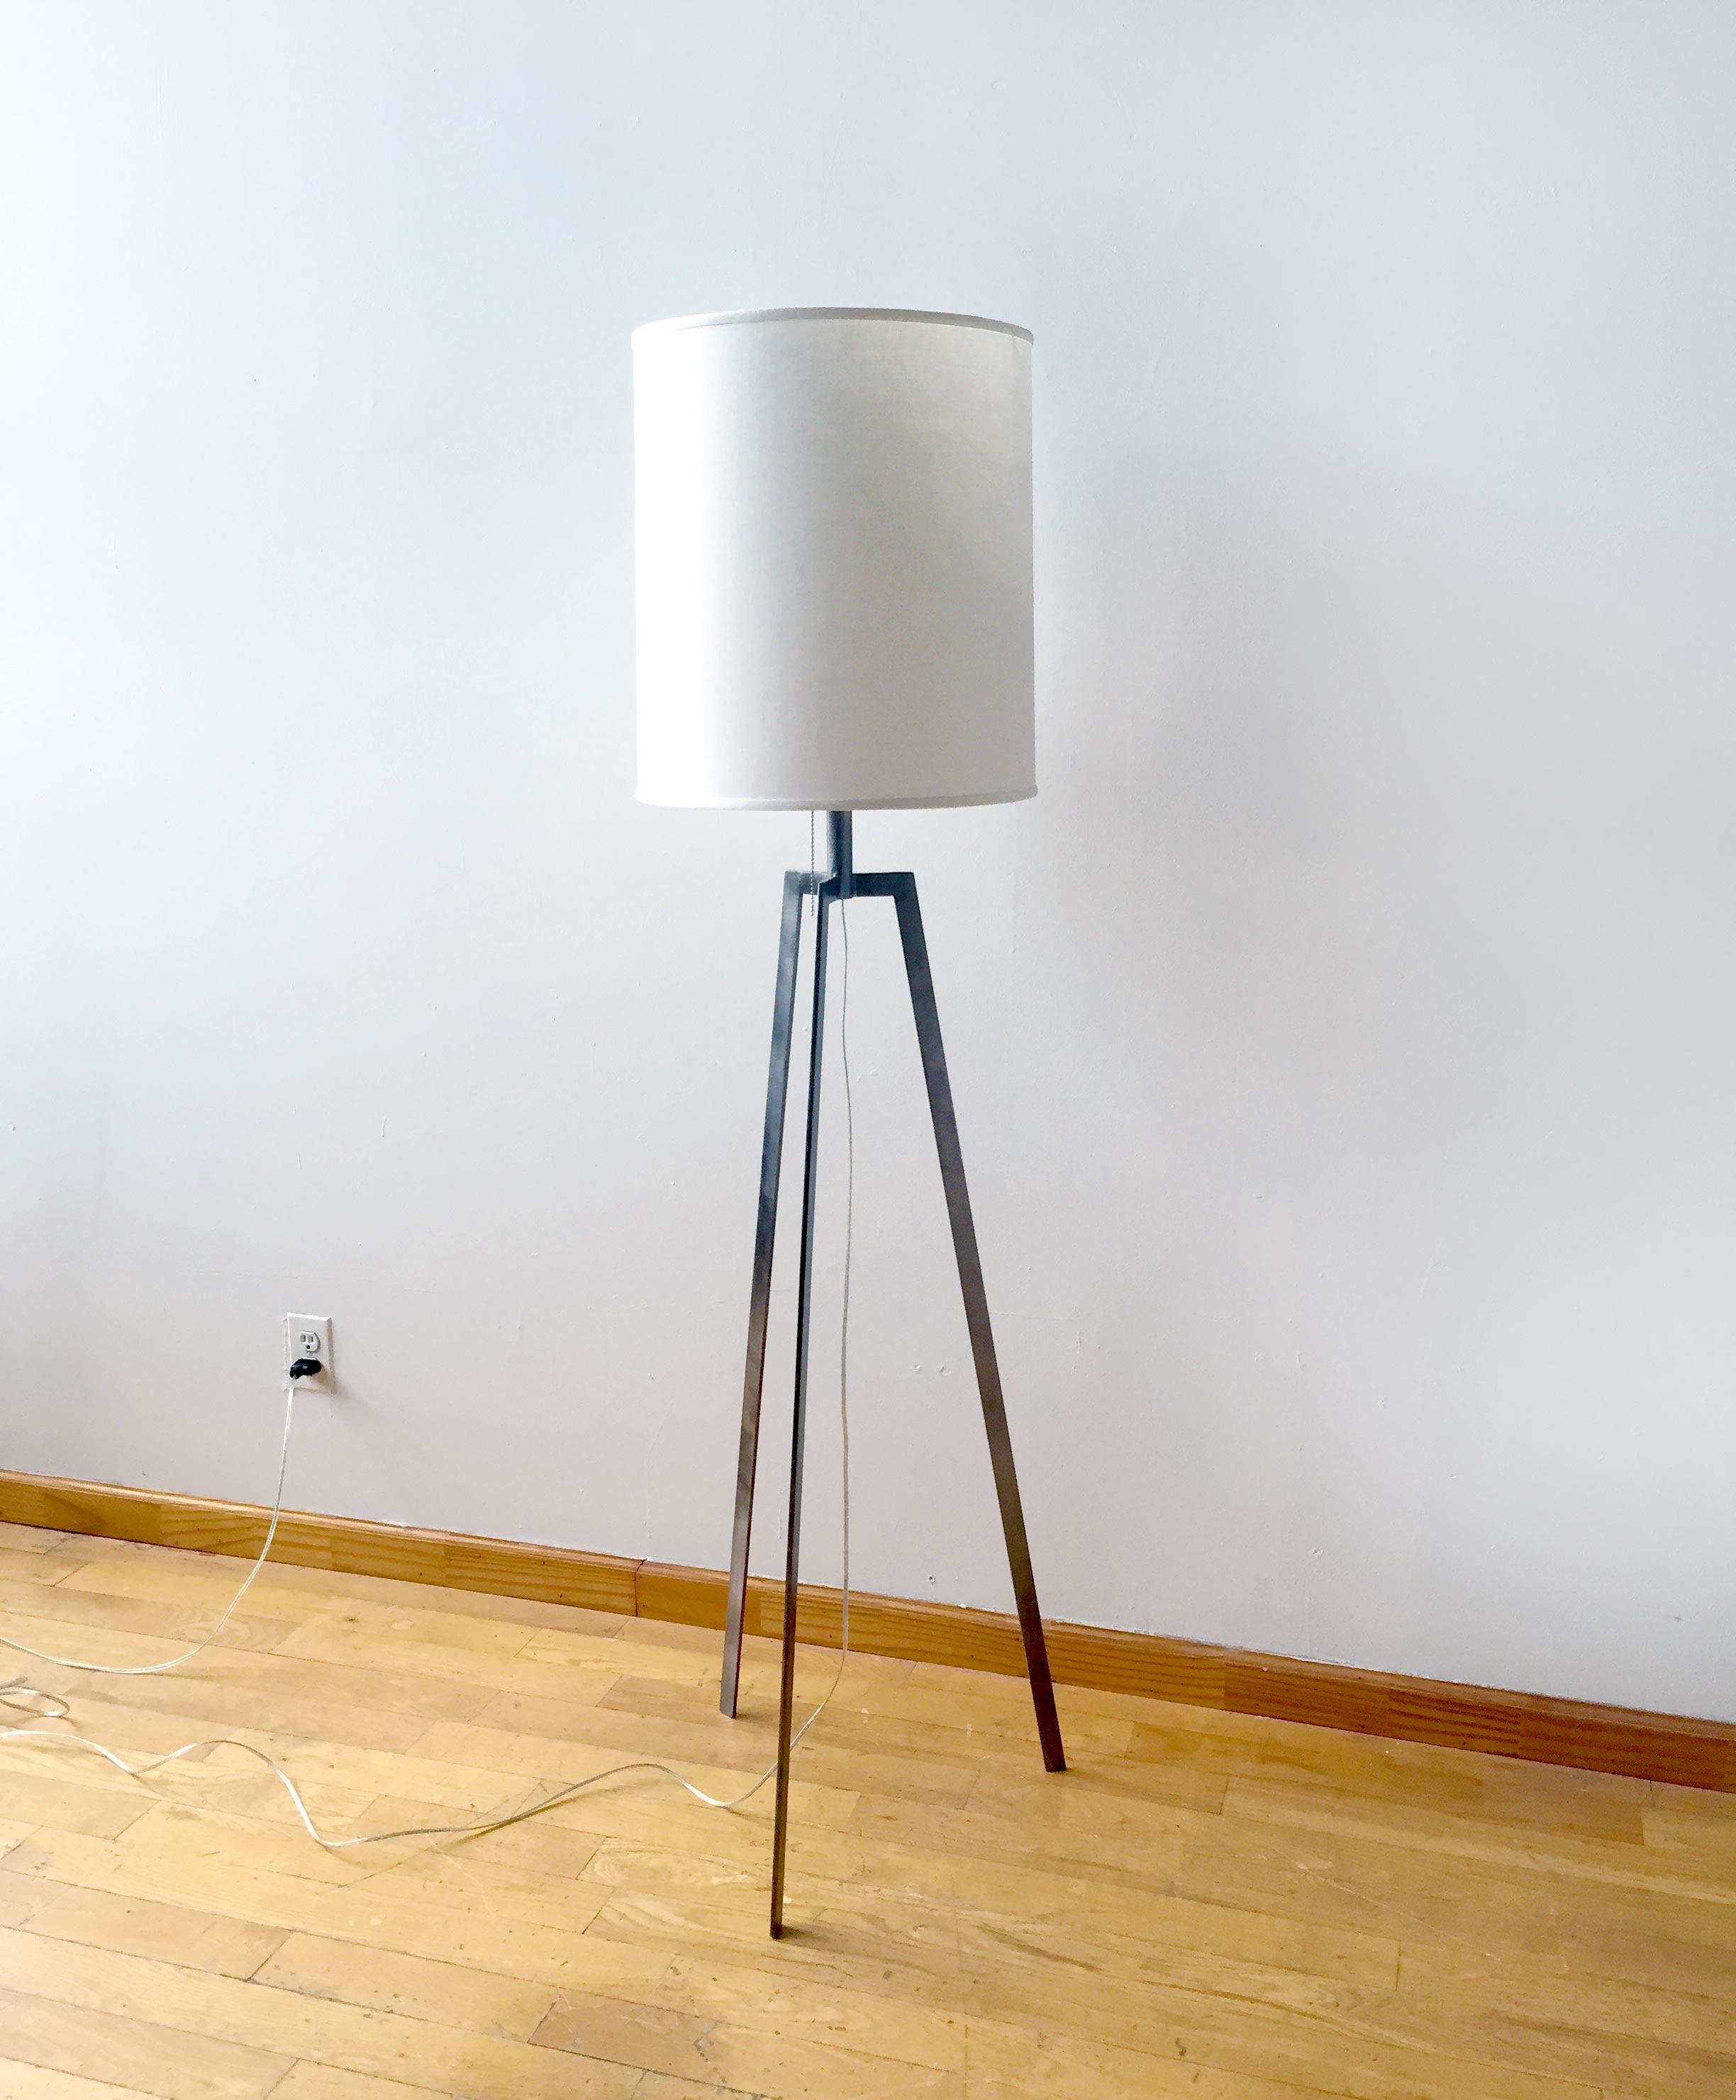 Lamp1_IMG_1551.jpg